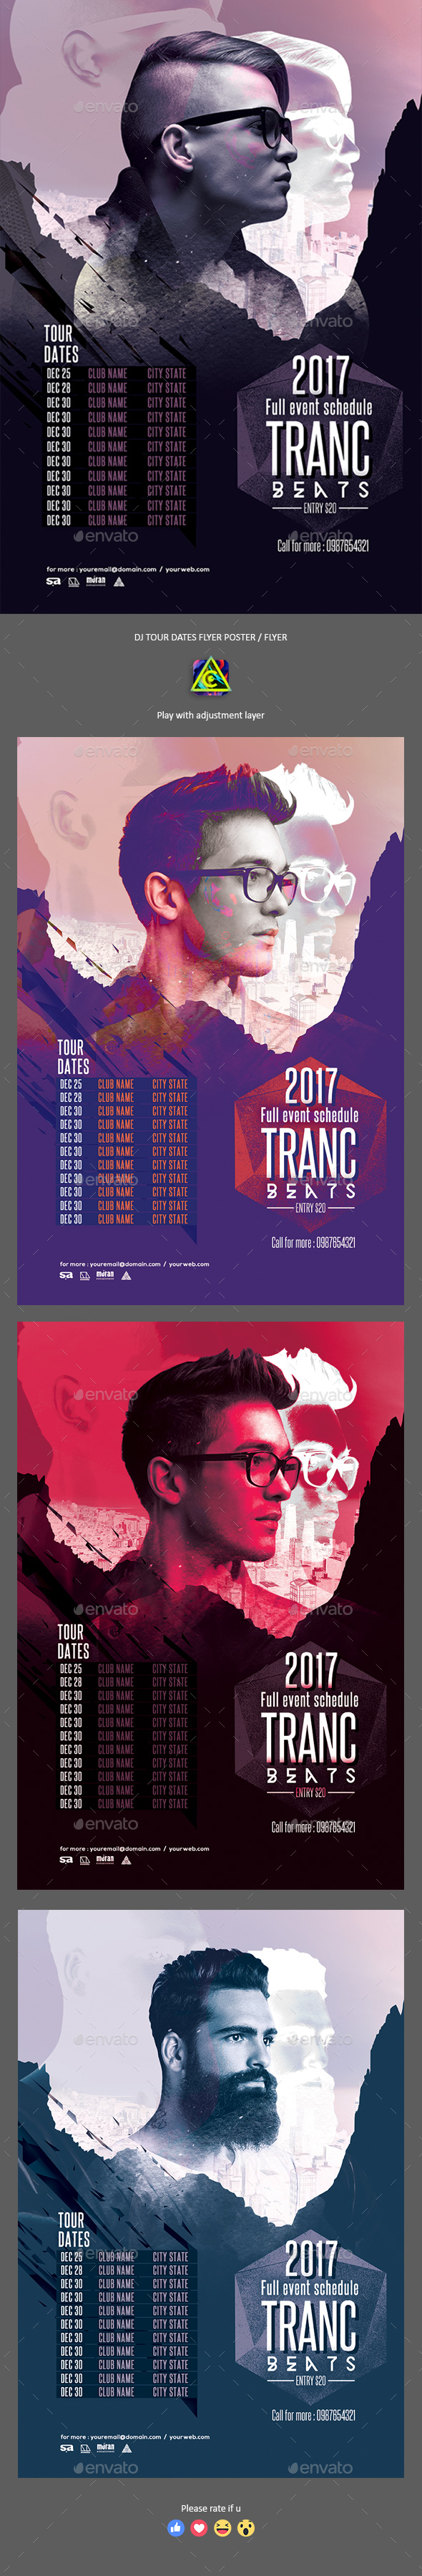 DJ Tour Dates Poster / Flyer - Clubs & Parties Events